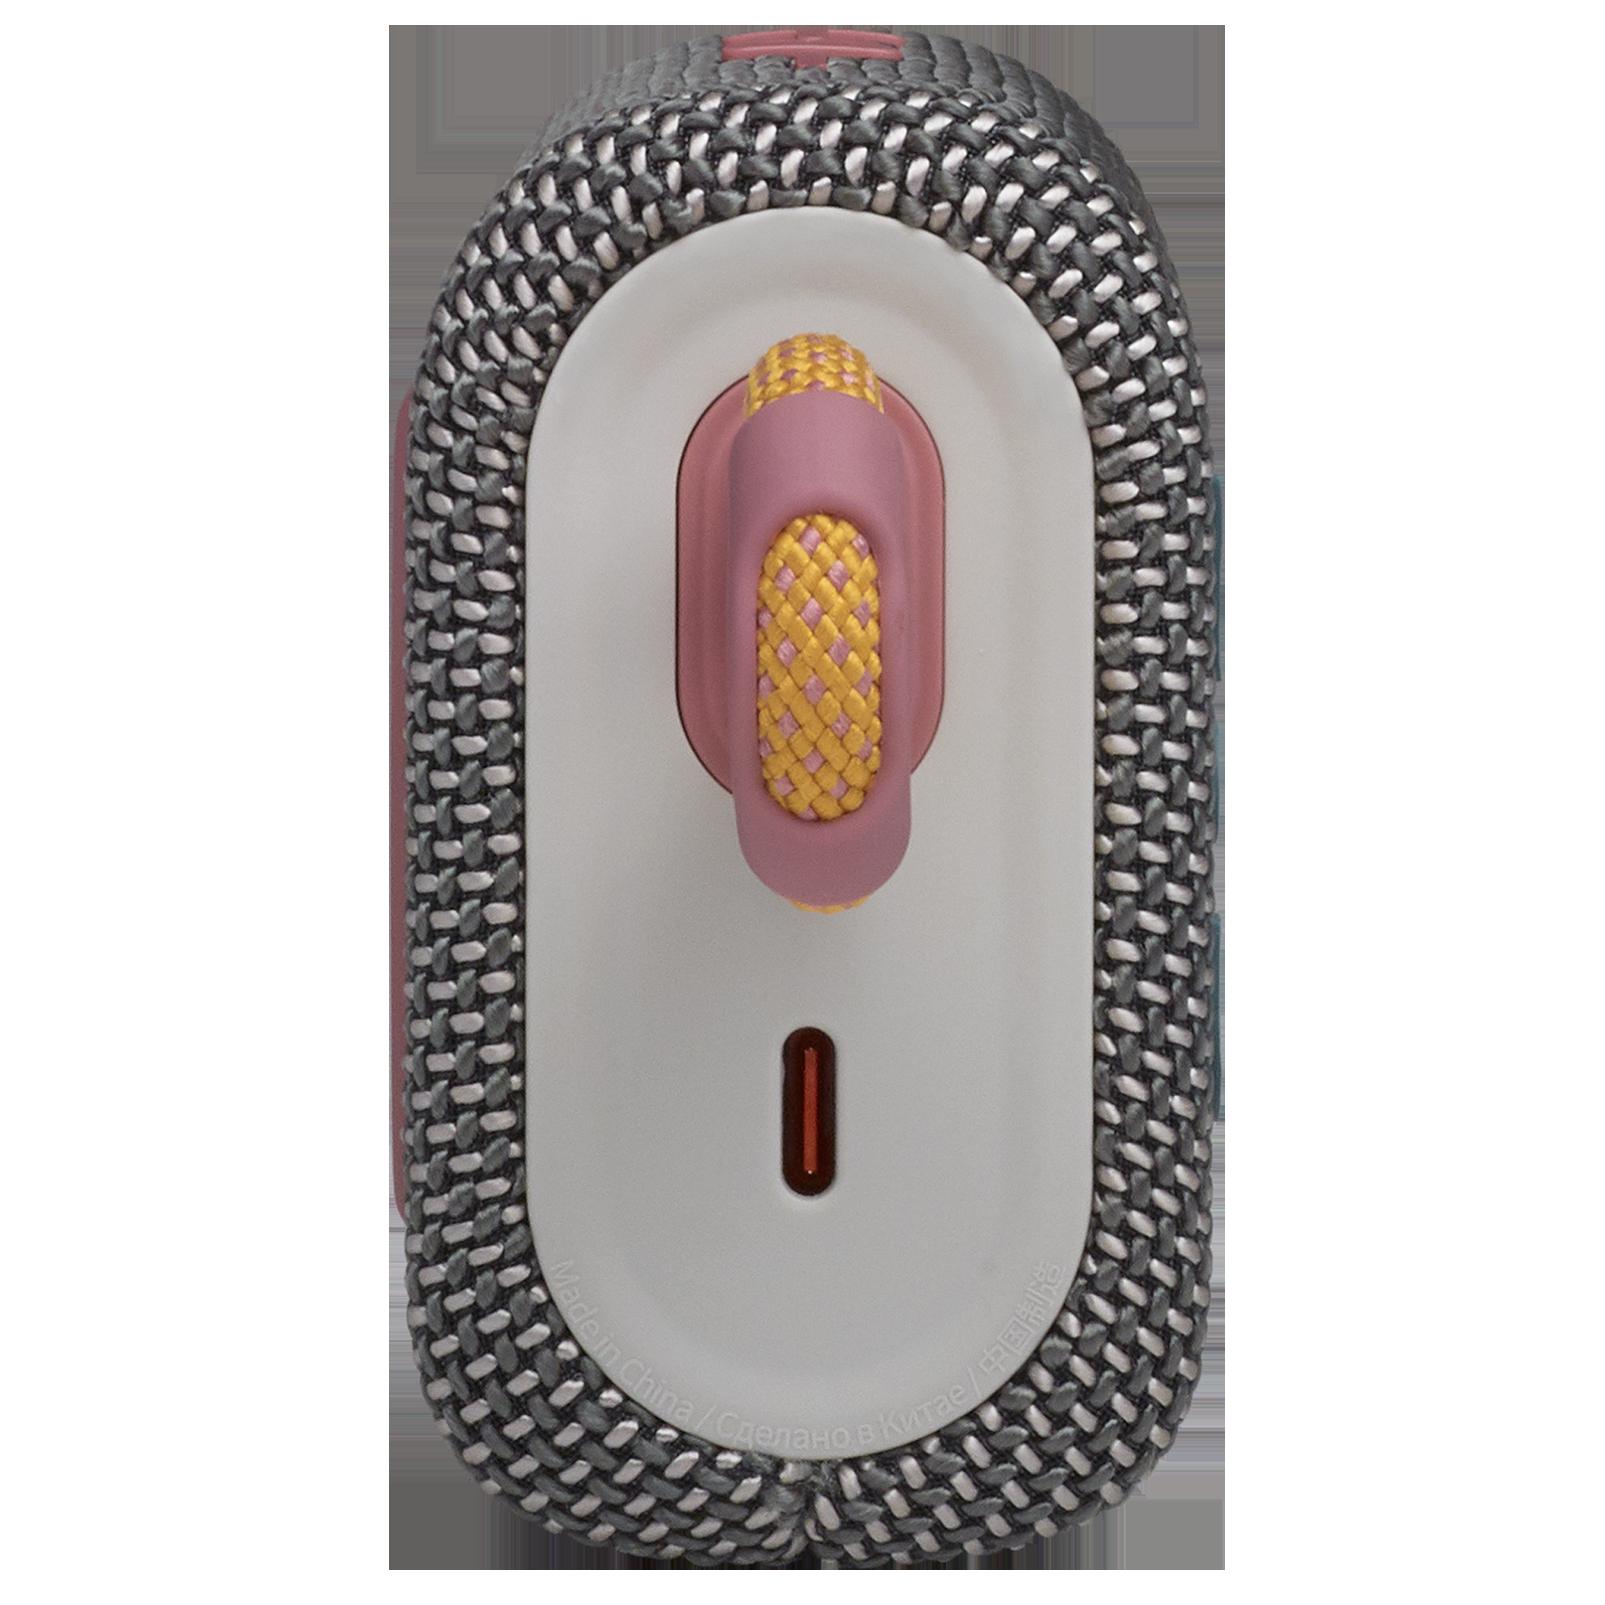 JBL Go 3 - Grey - Portable Waterproof Speaker - Left